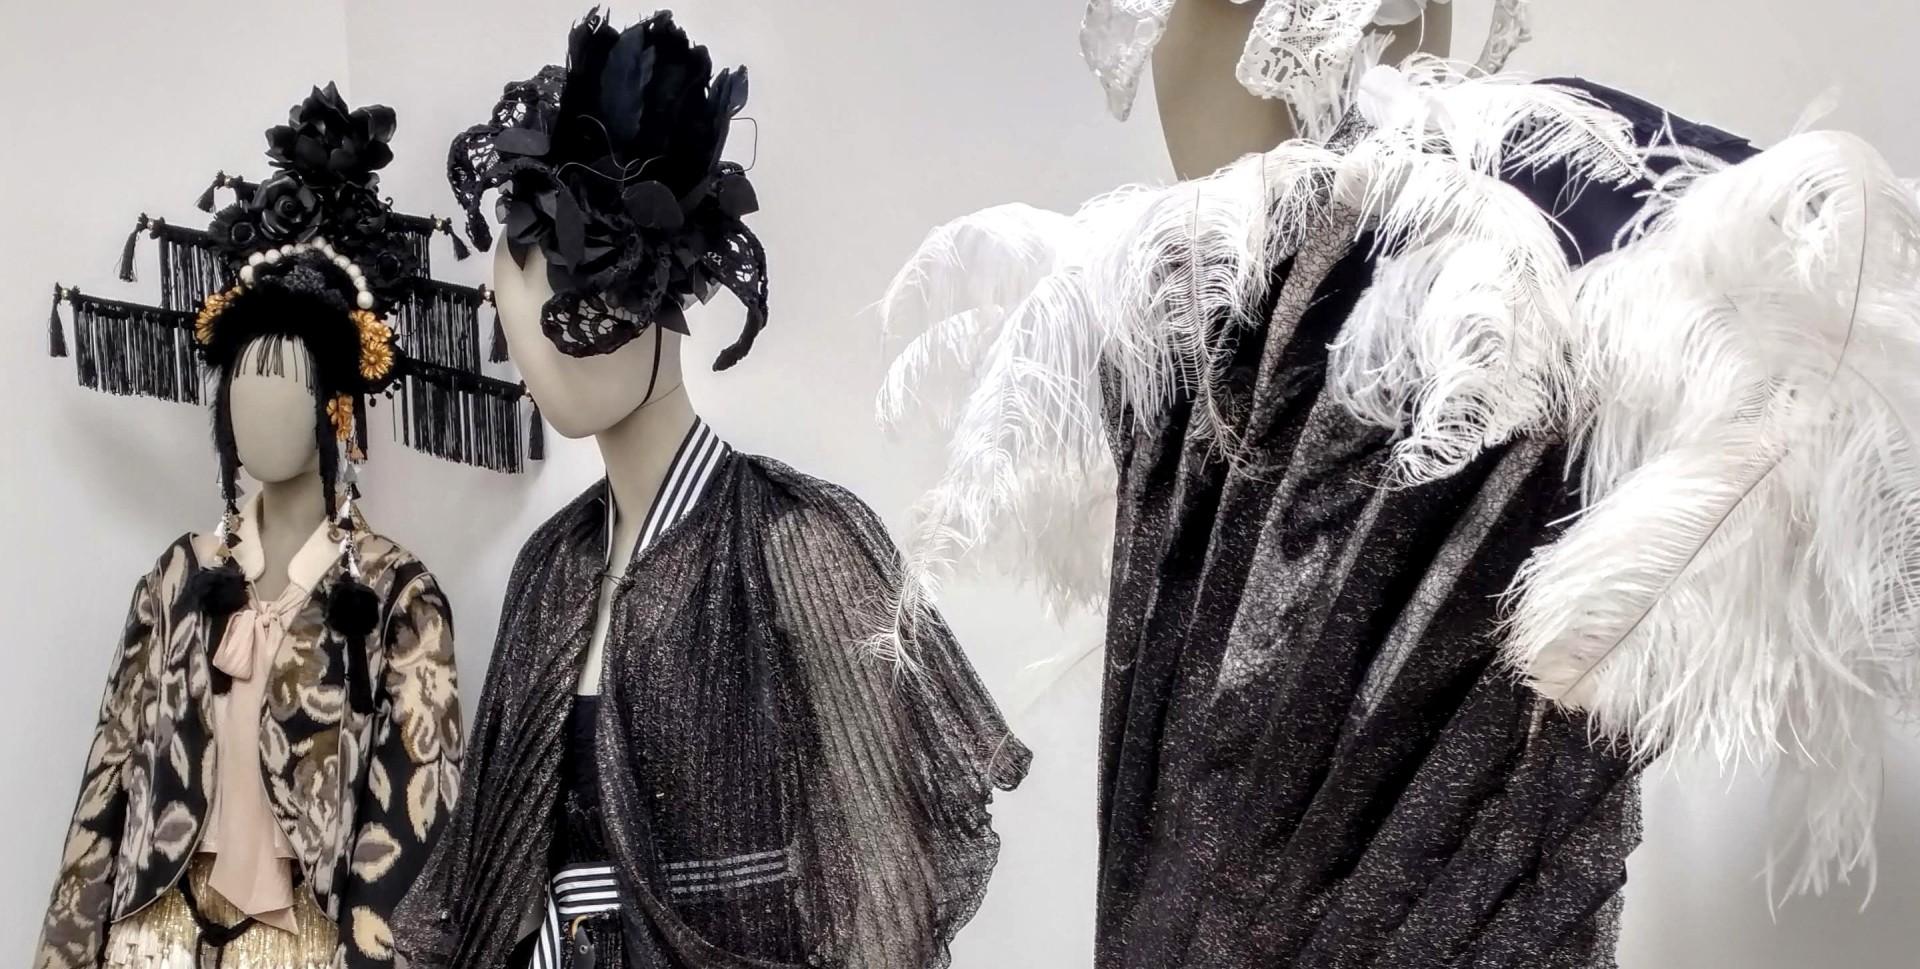 Blurred Boundaries Fashion as an Art, [far left] Alena Kalana and Hera Zhou, designers, ©EDGExpo.com